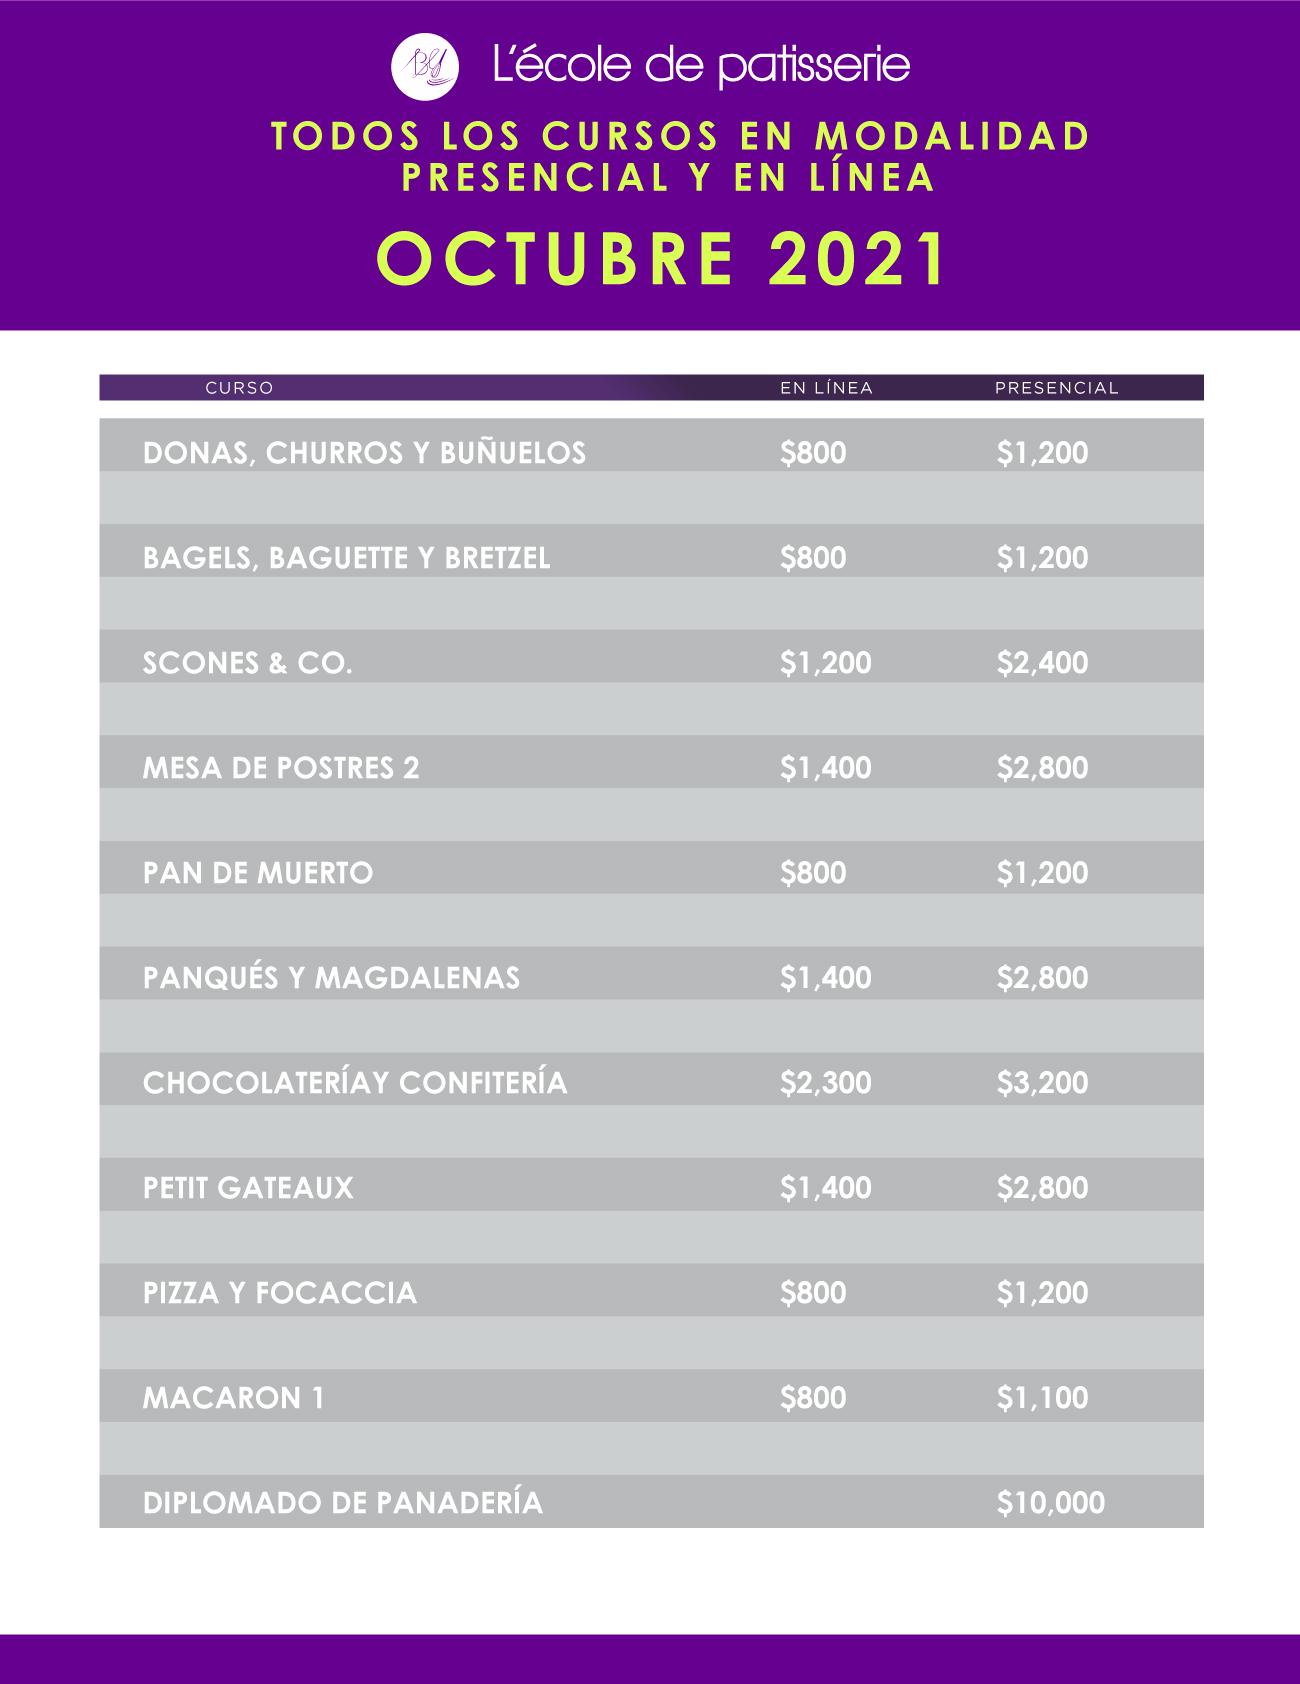 LEC_calendario1021-precios